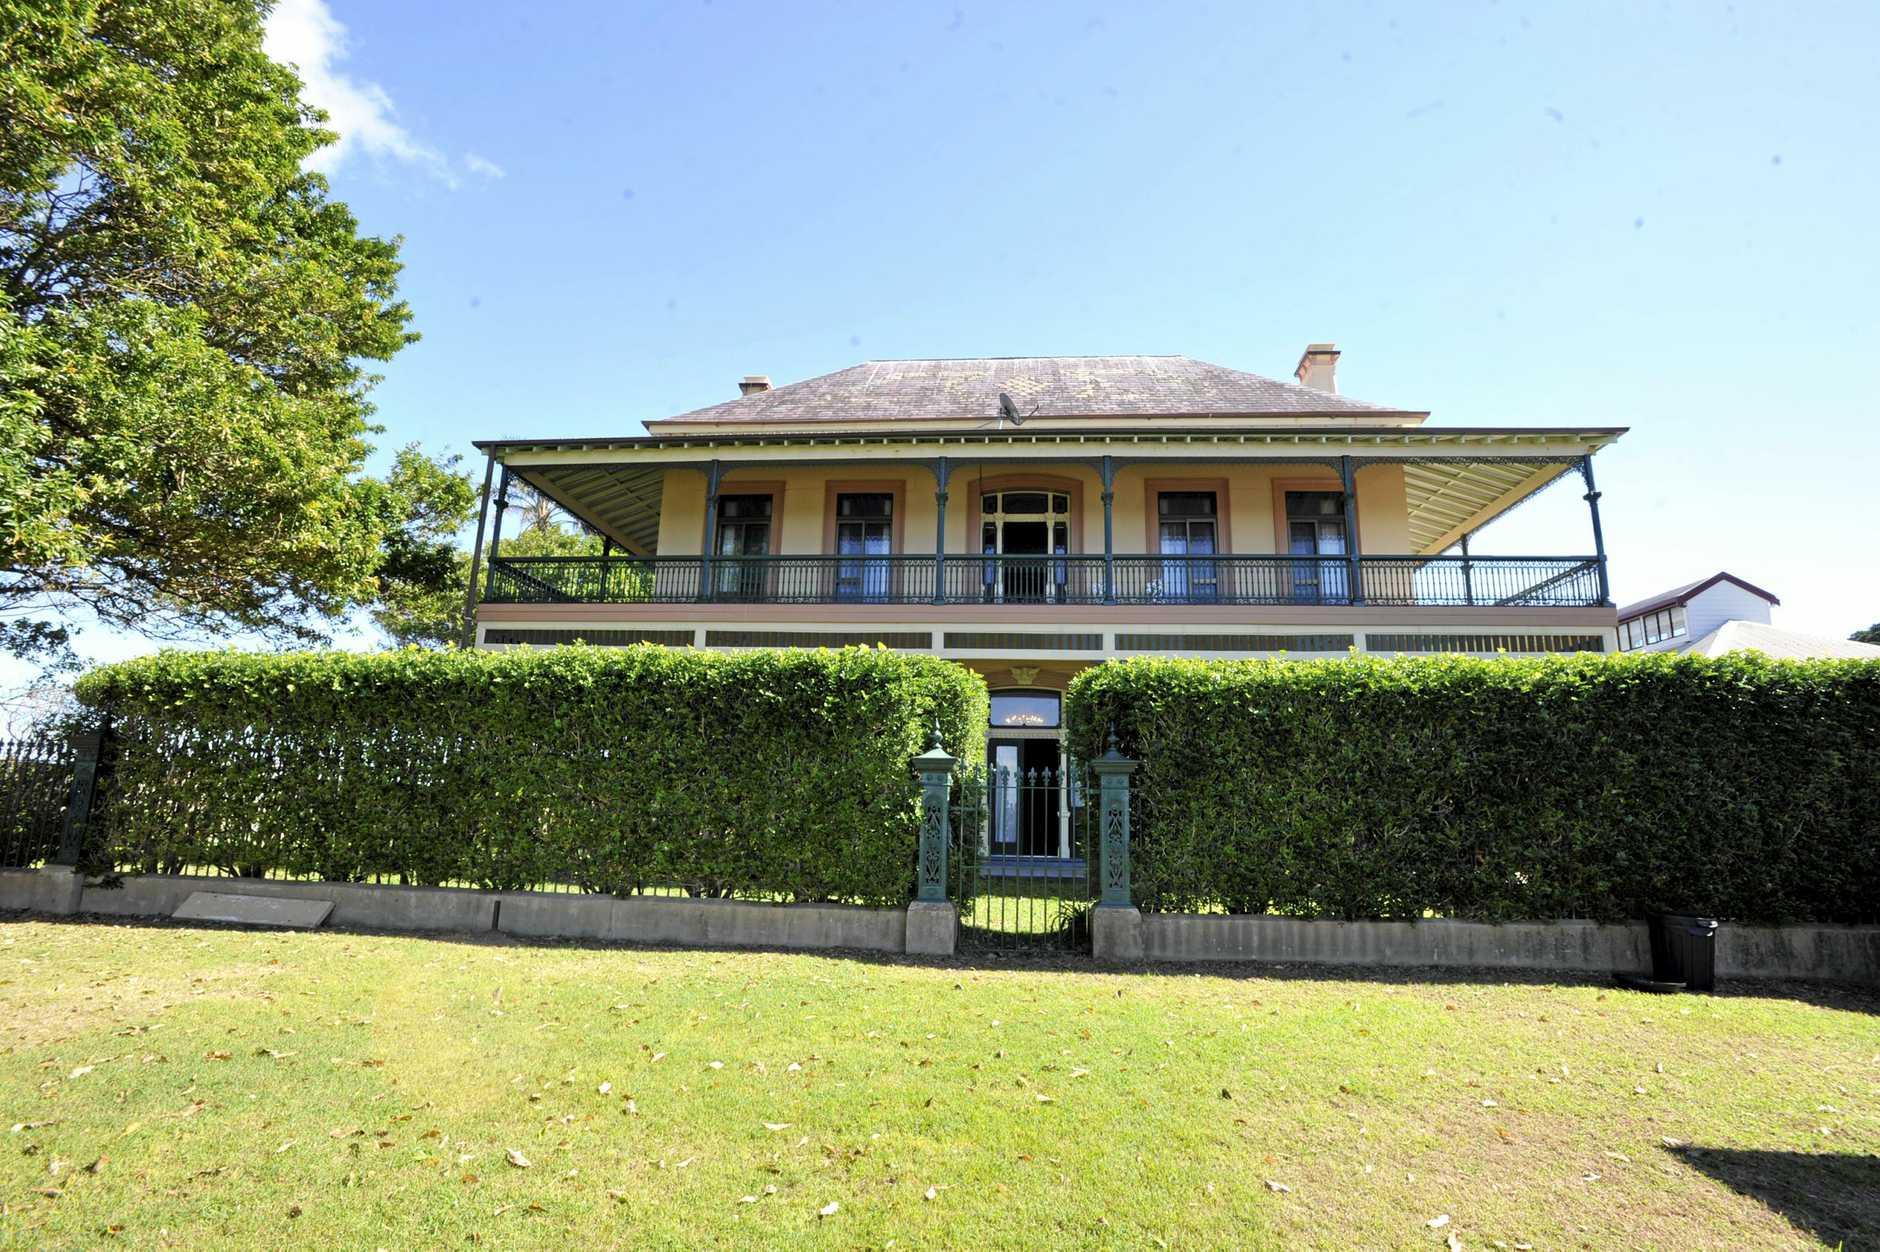 Fenwick House at Shaws Bay in Ballina. Photo Cathy Adams / The Northern Star